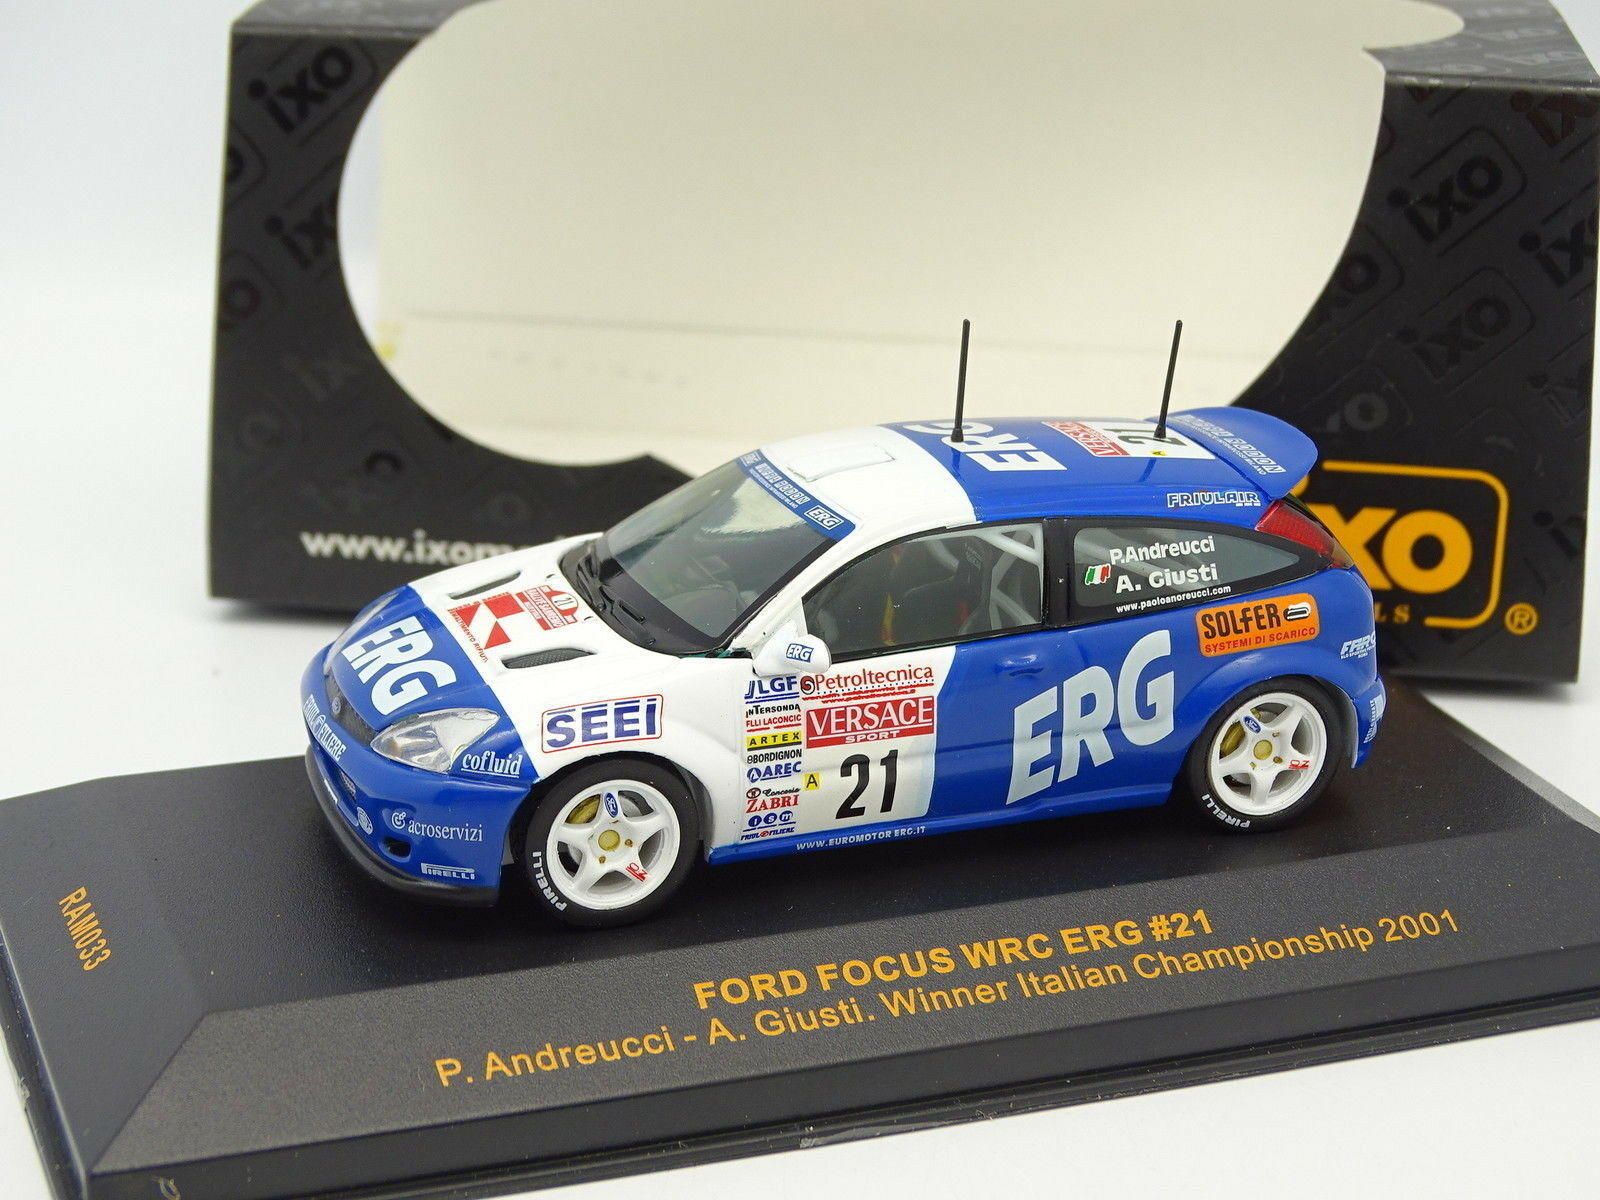 IXO 1 43 Ford Focus WRC ERG Winner Italian Championship 2001 NR ° 21